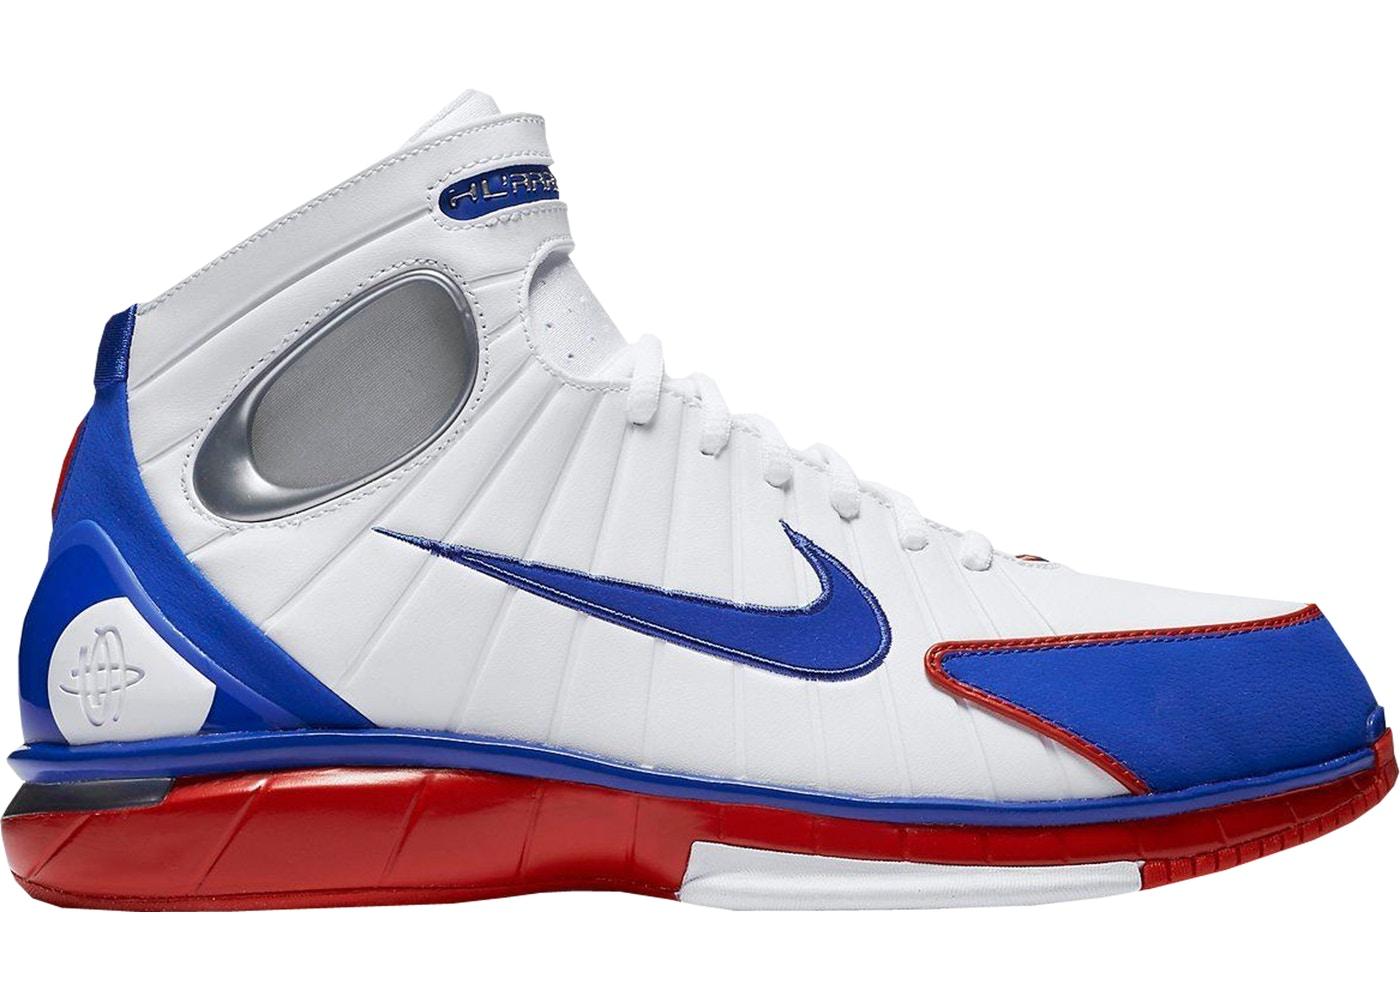 Nike Zoom Air Huarache 2K4 Shoes